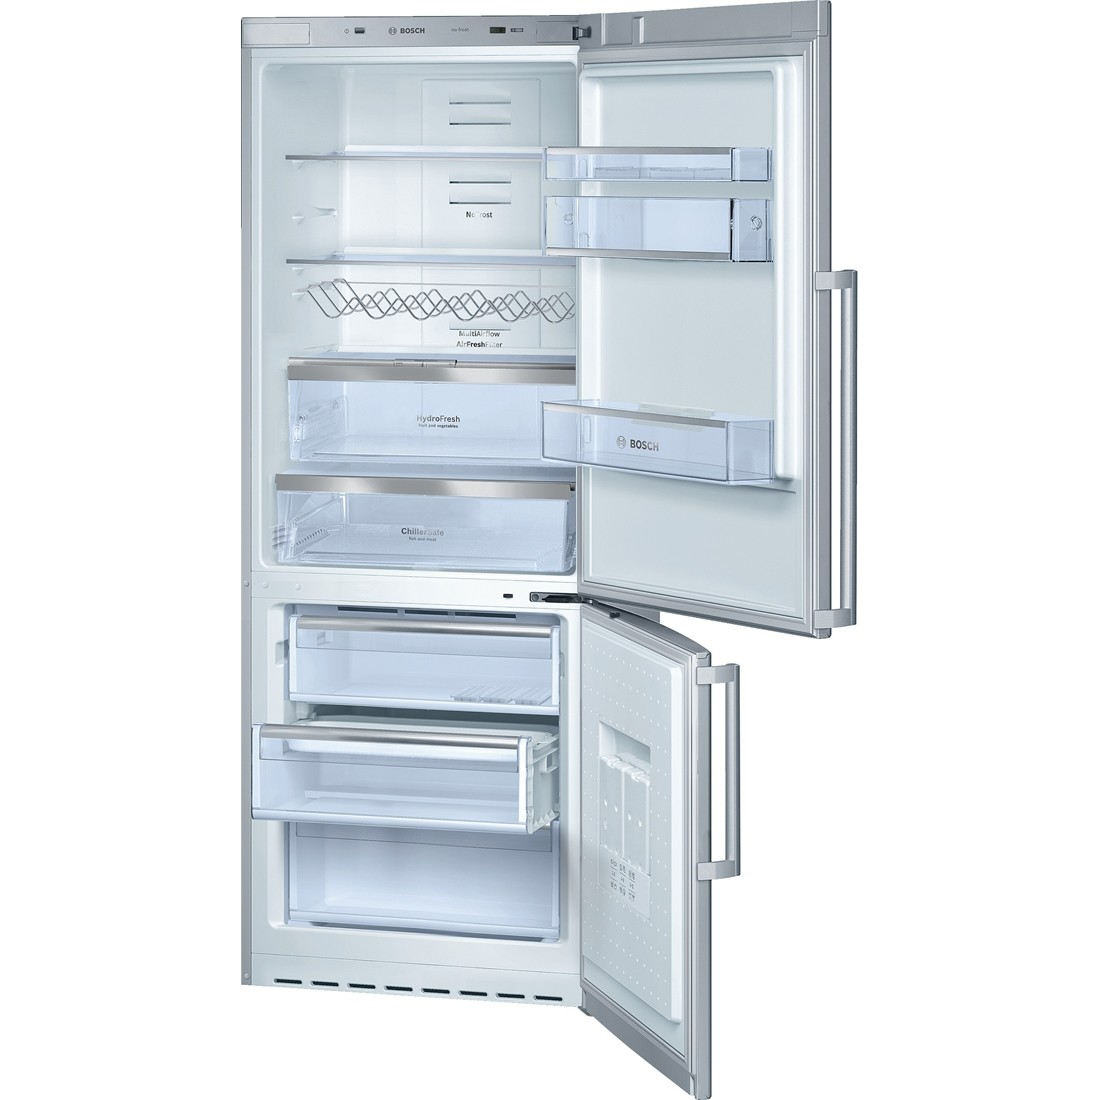 Los 5 mejores frigor ficos combi bosch frigor ficos en for Frigorificos bosch carrefour